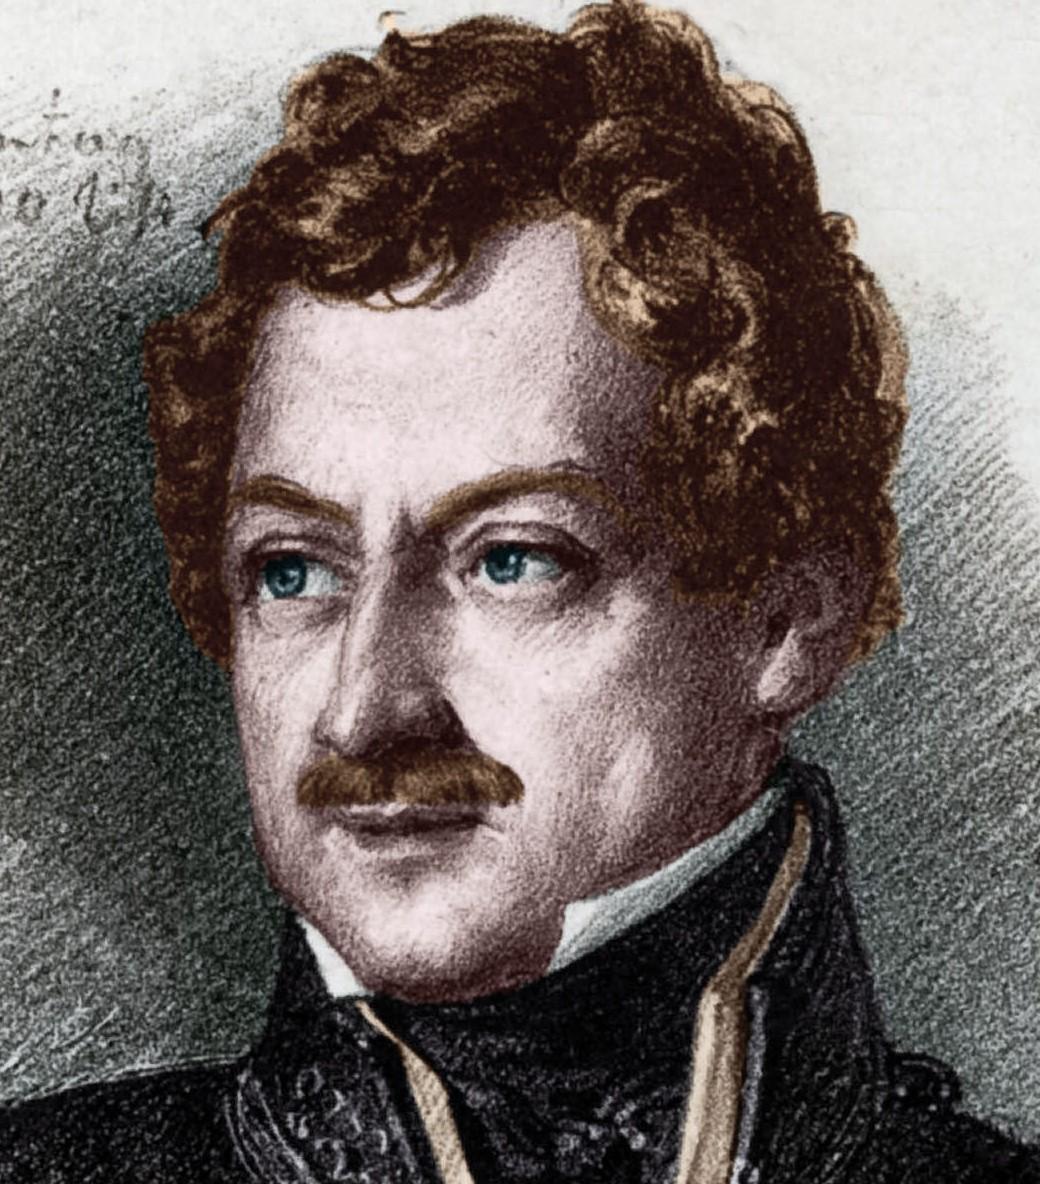 Lajos Szechenyi